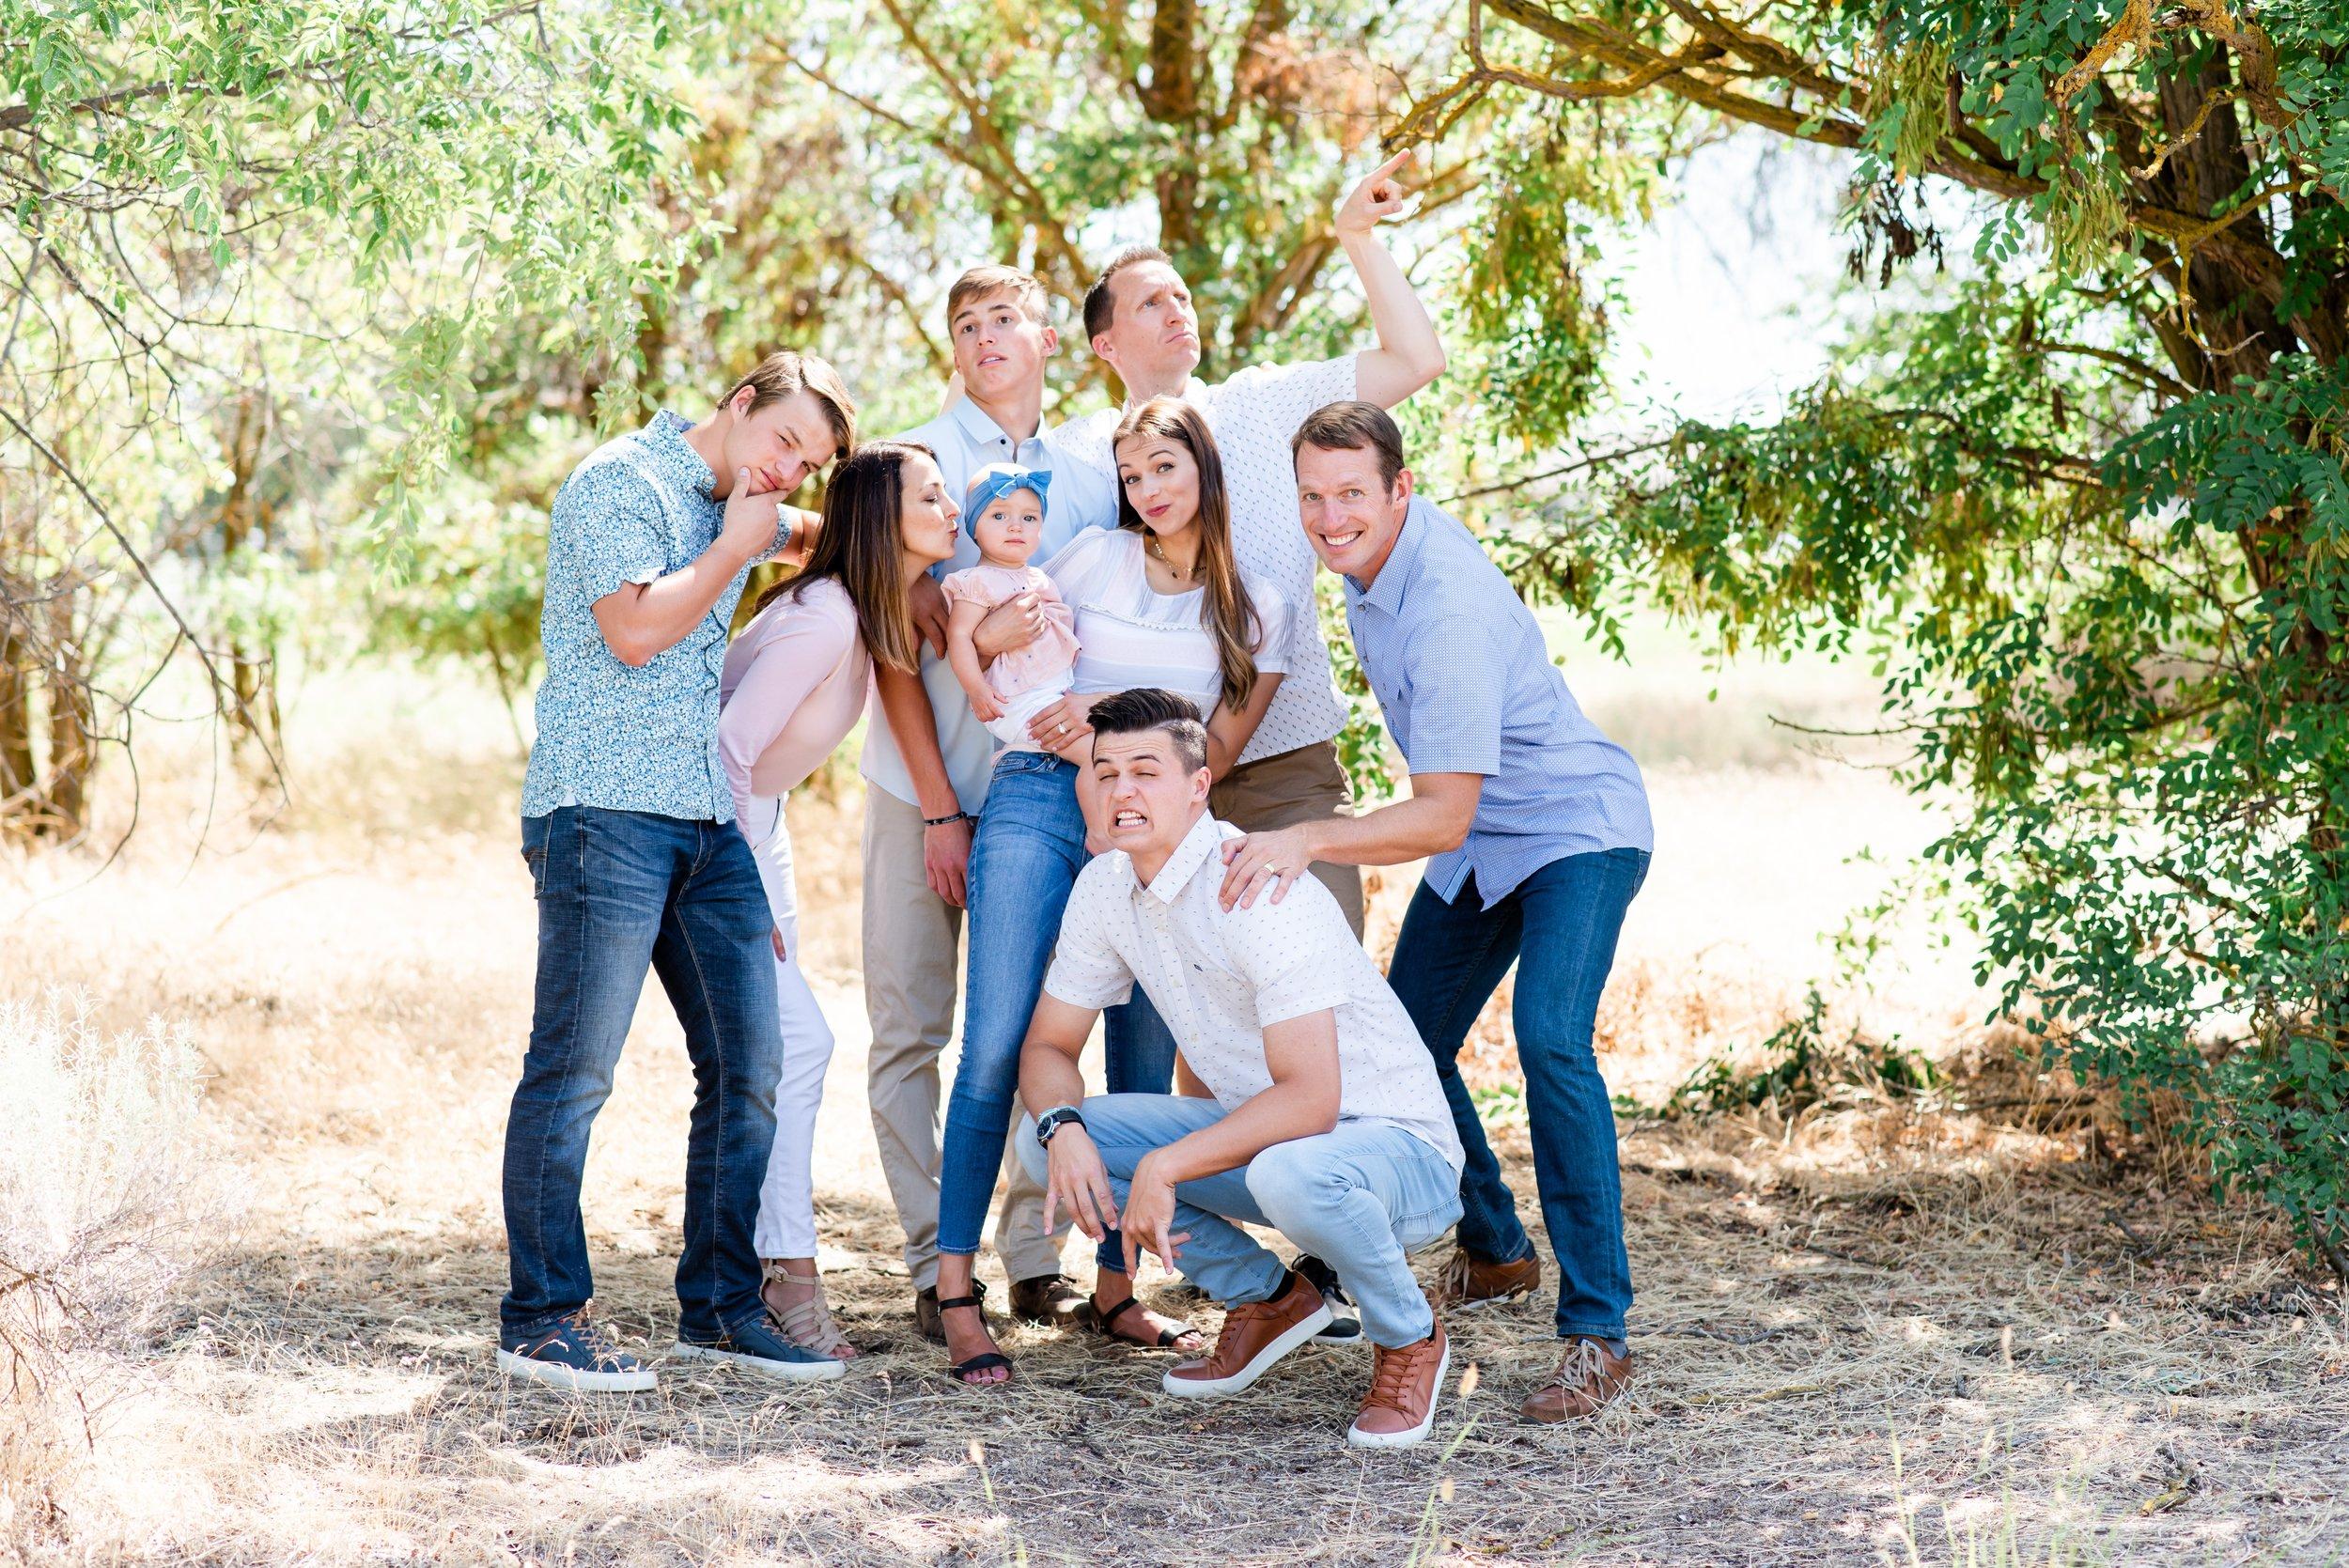 Moses Lake Washington Family Photos - Morgan Tayler Photo & Design - Moses Lake Washington Family Photographer - What to Wear in Family Photos